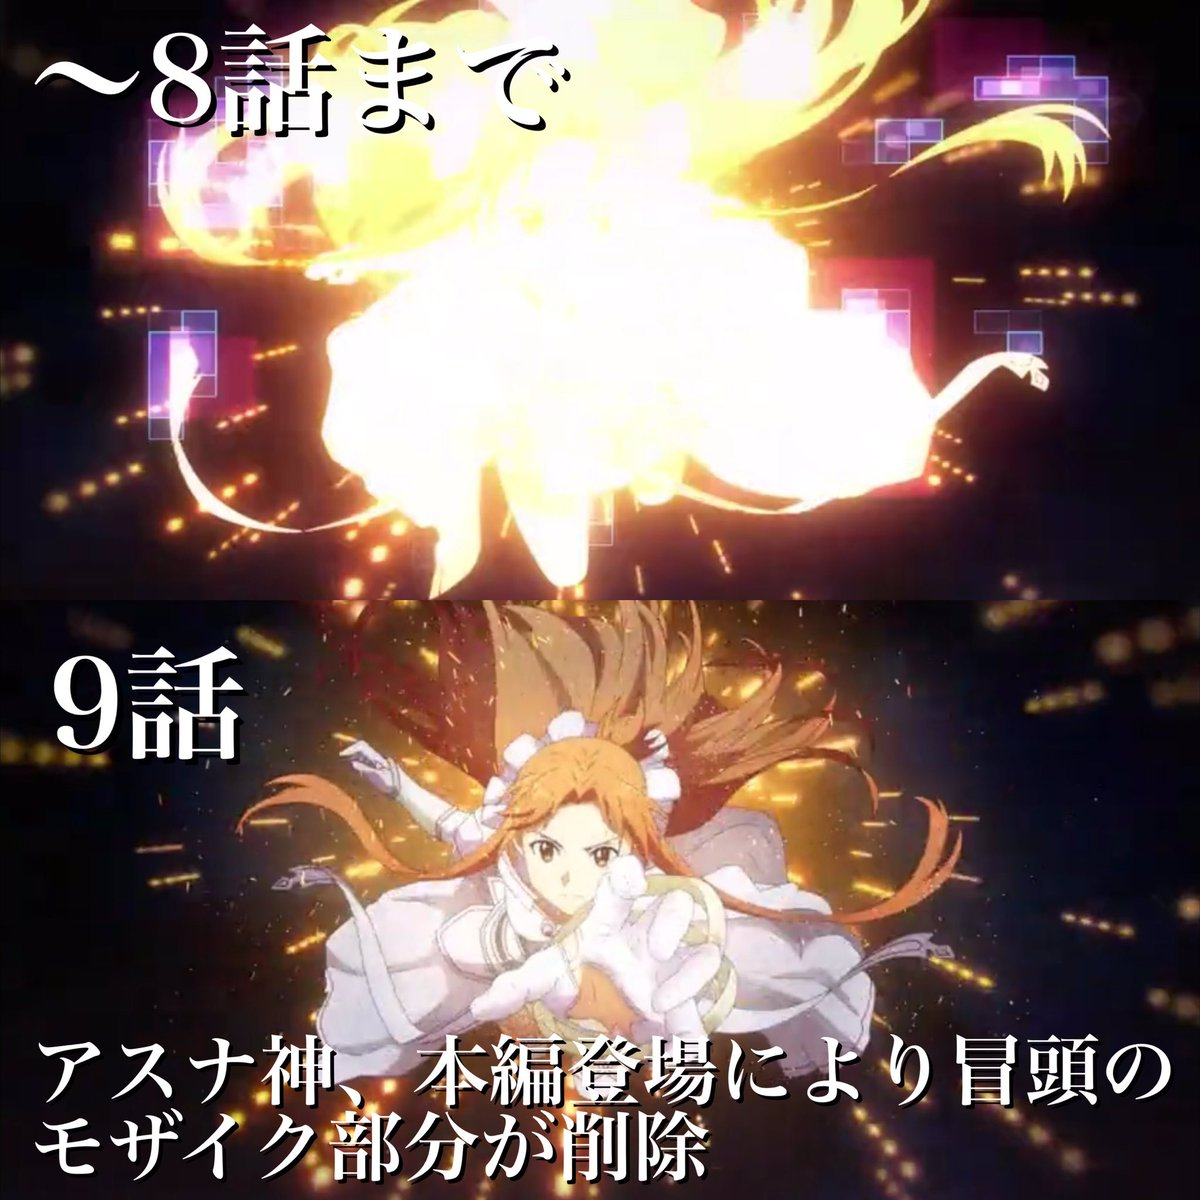 SAO3期最新OP映像の相違点まとめました製作陣の皆様一生ついて行きます#sao_anime